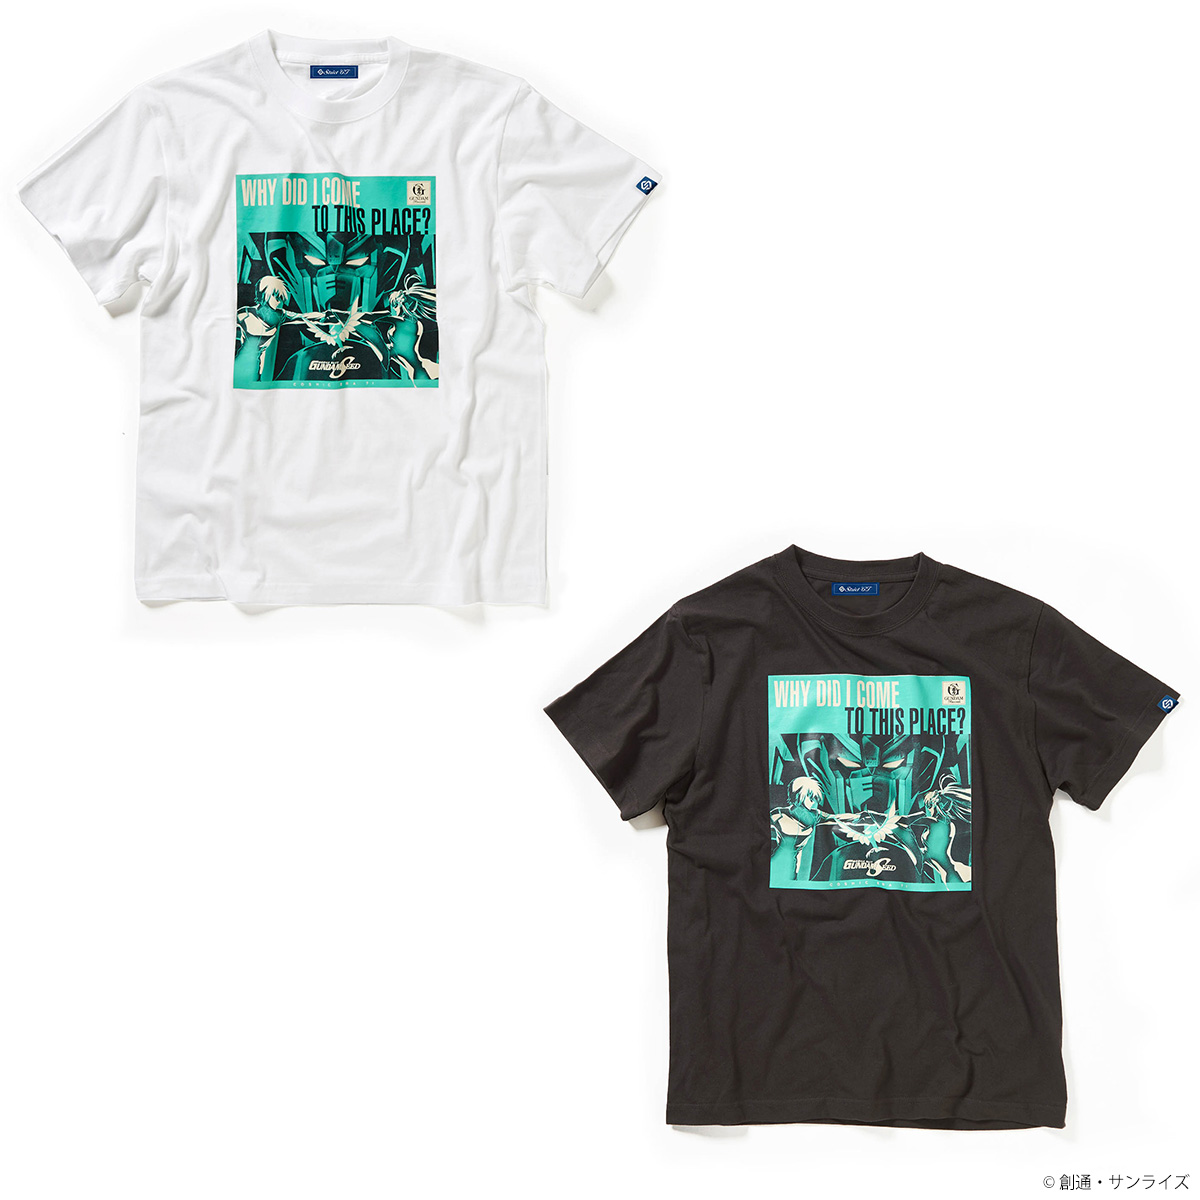 STRICT-G GUNDAM RECORDS 『機動戦士ガンダムSEED』Tシャツ